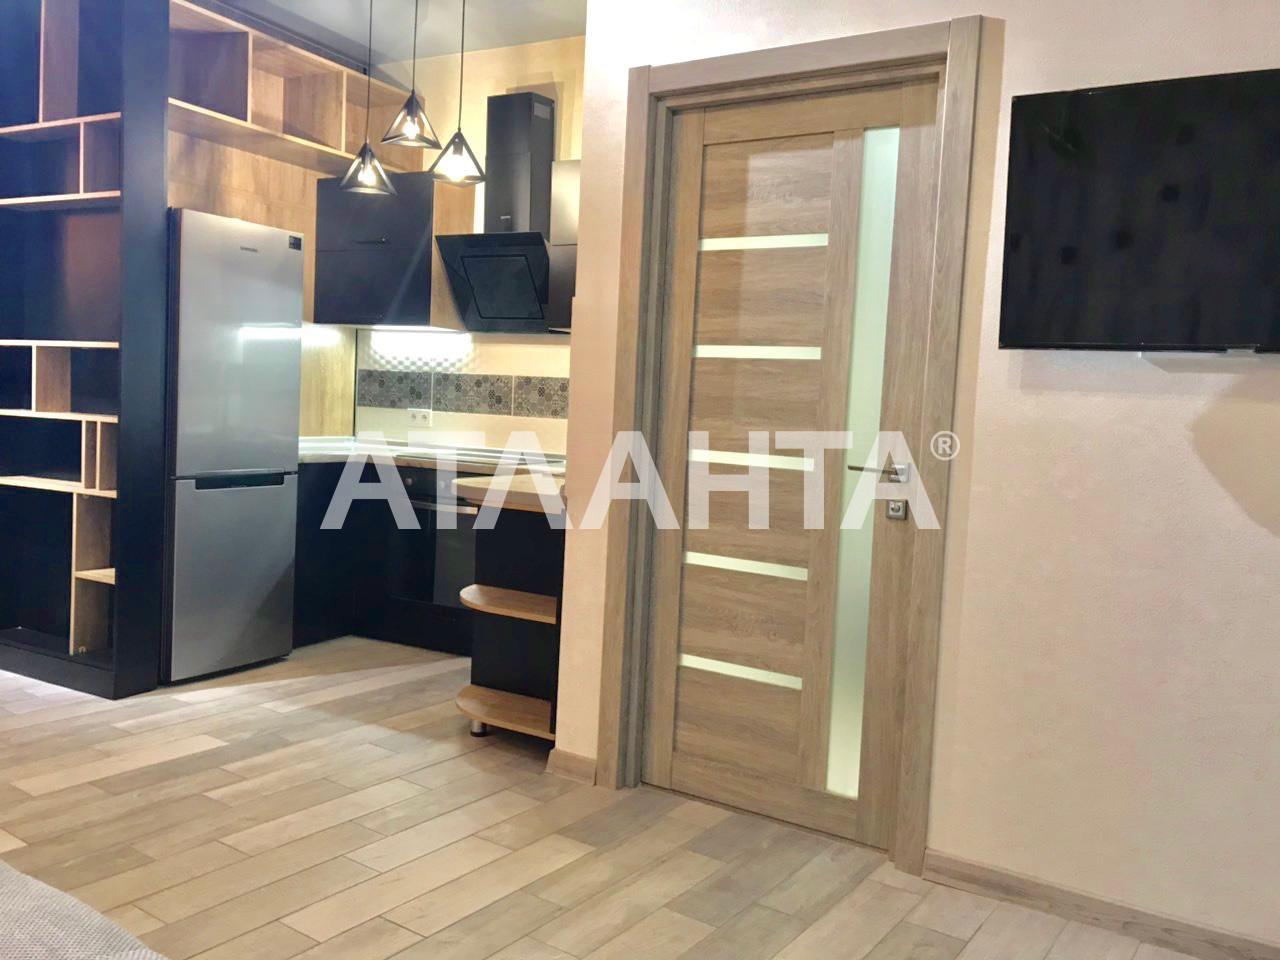 Продается 1-комнатная Квартира на ул. Генуэзская — 68 000 у.е. (фото №9)